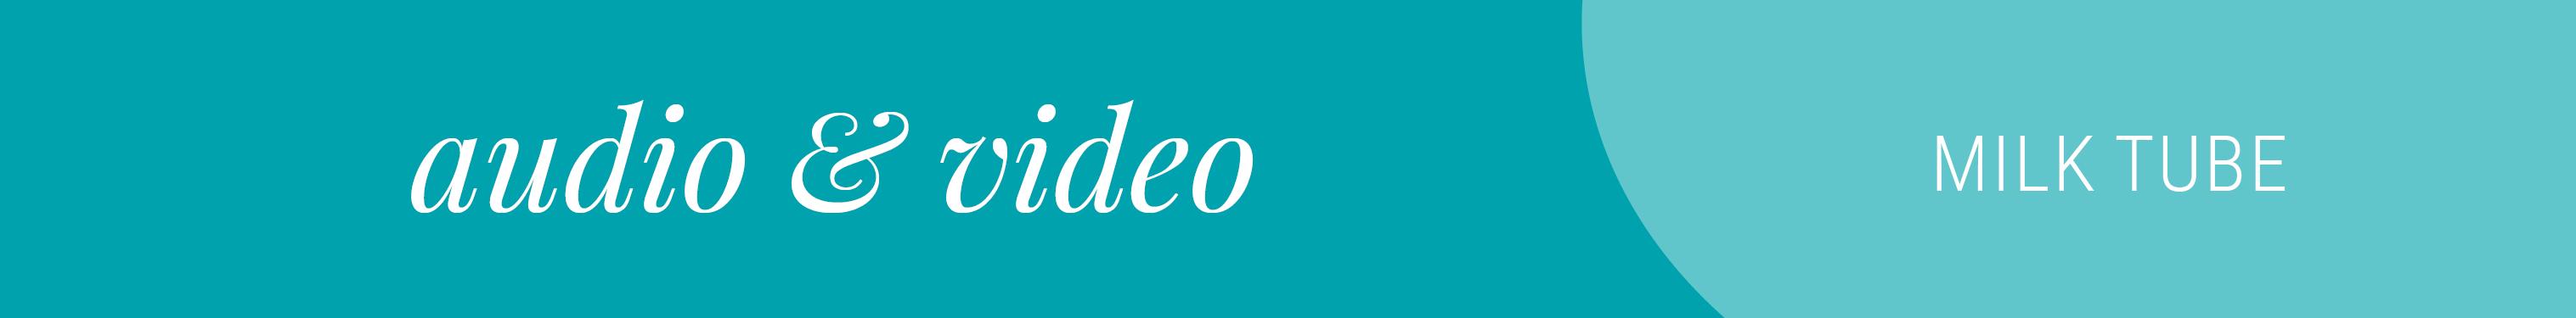 audiovideo2